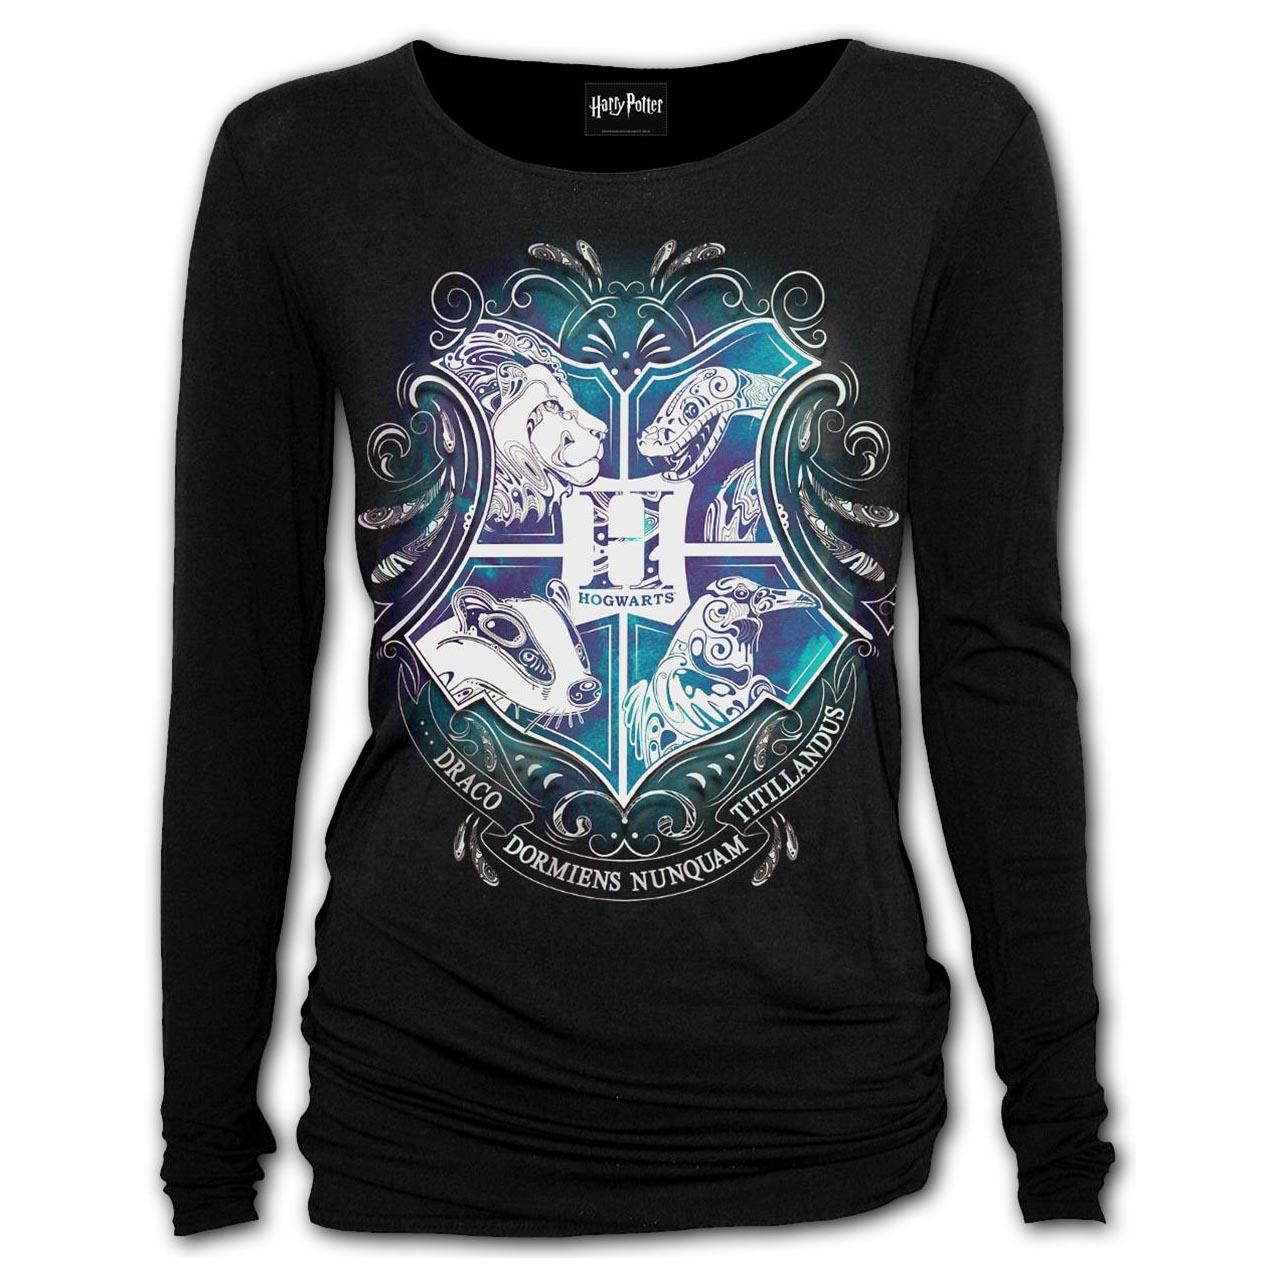 Spiral-Ladies-Black-Harry-Potter-HOGWARTS-Crest-L-Sleeve-Top-All-Sizes thumbnail 9